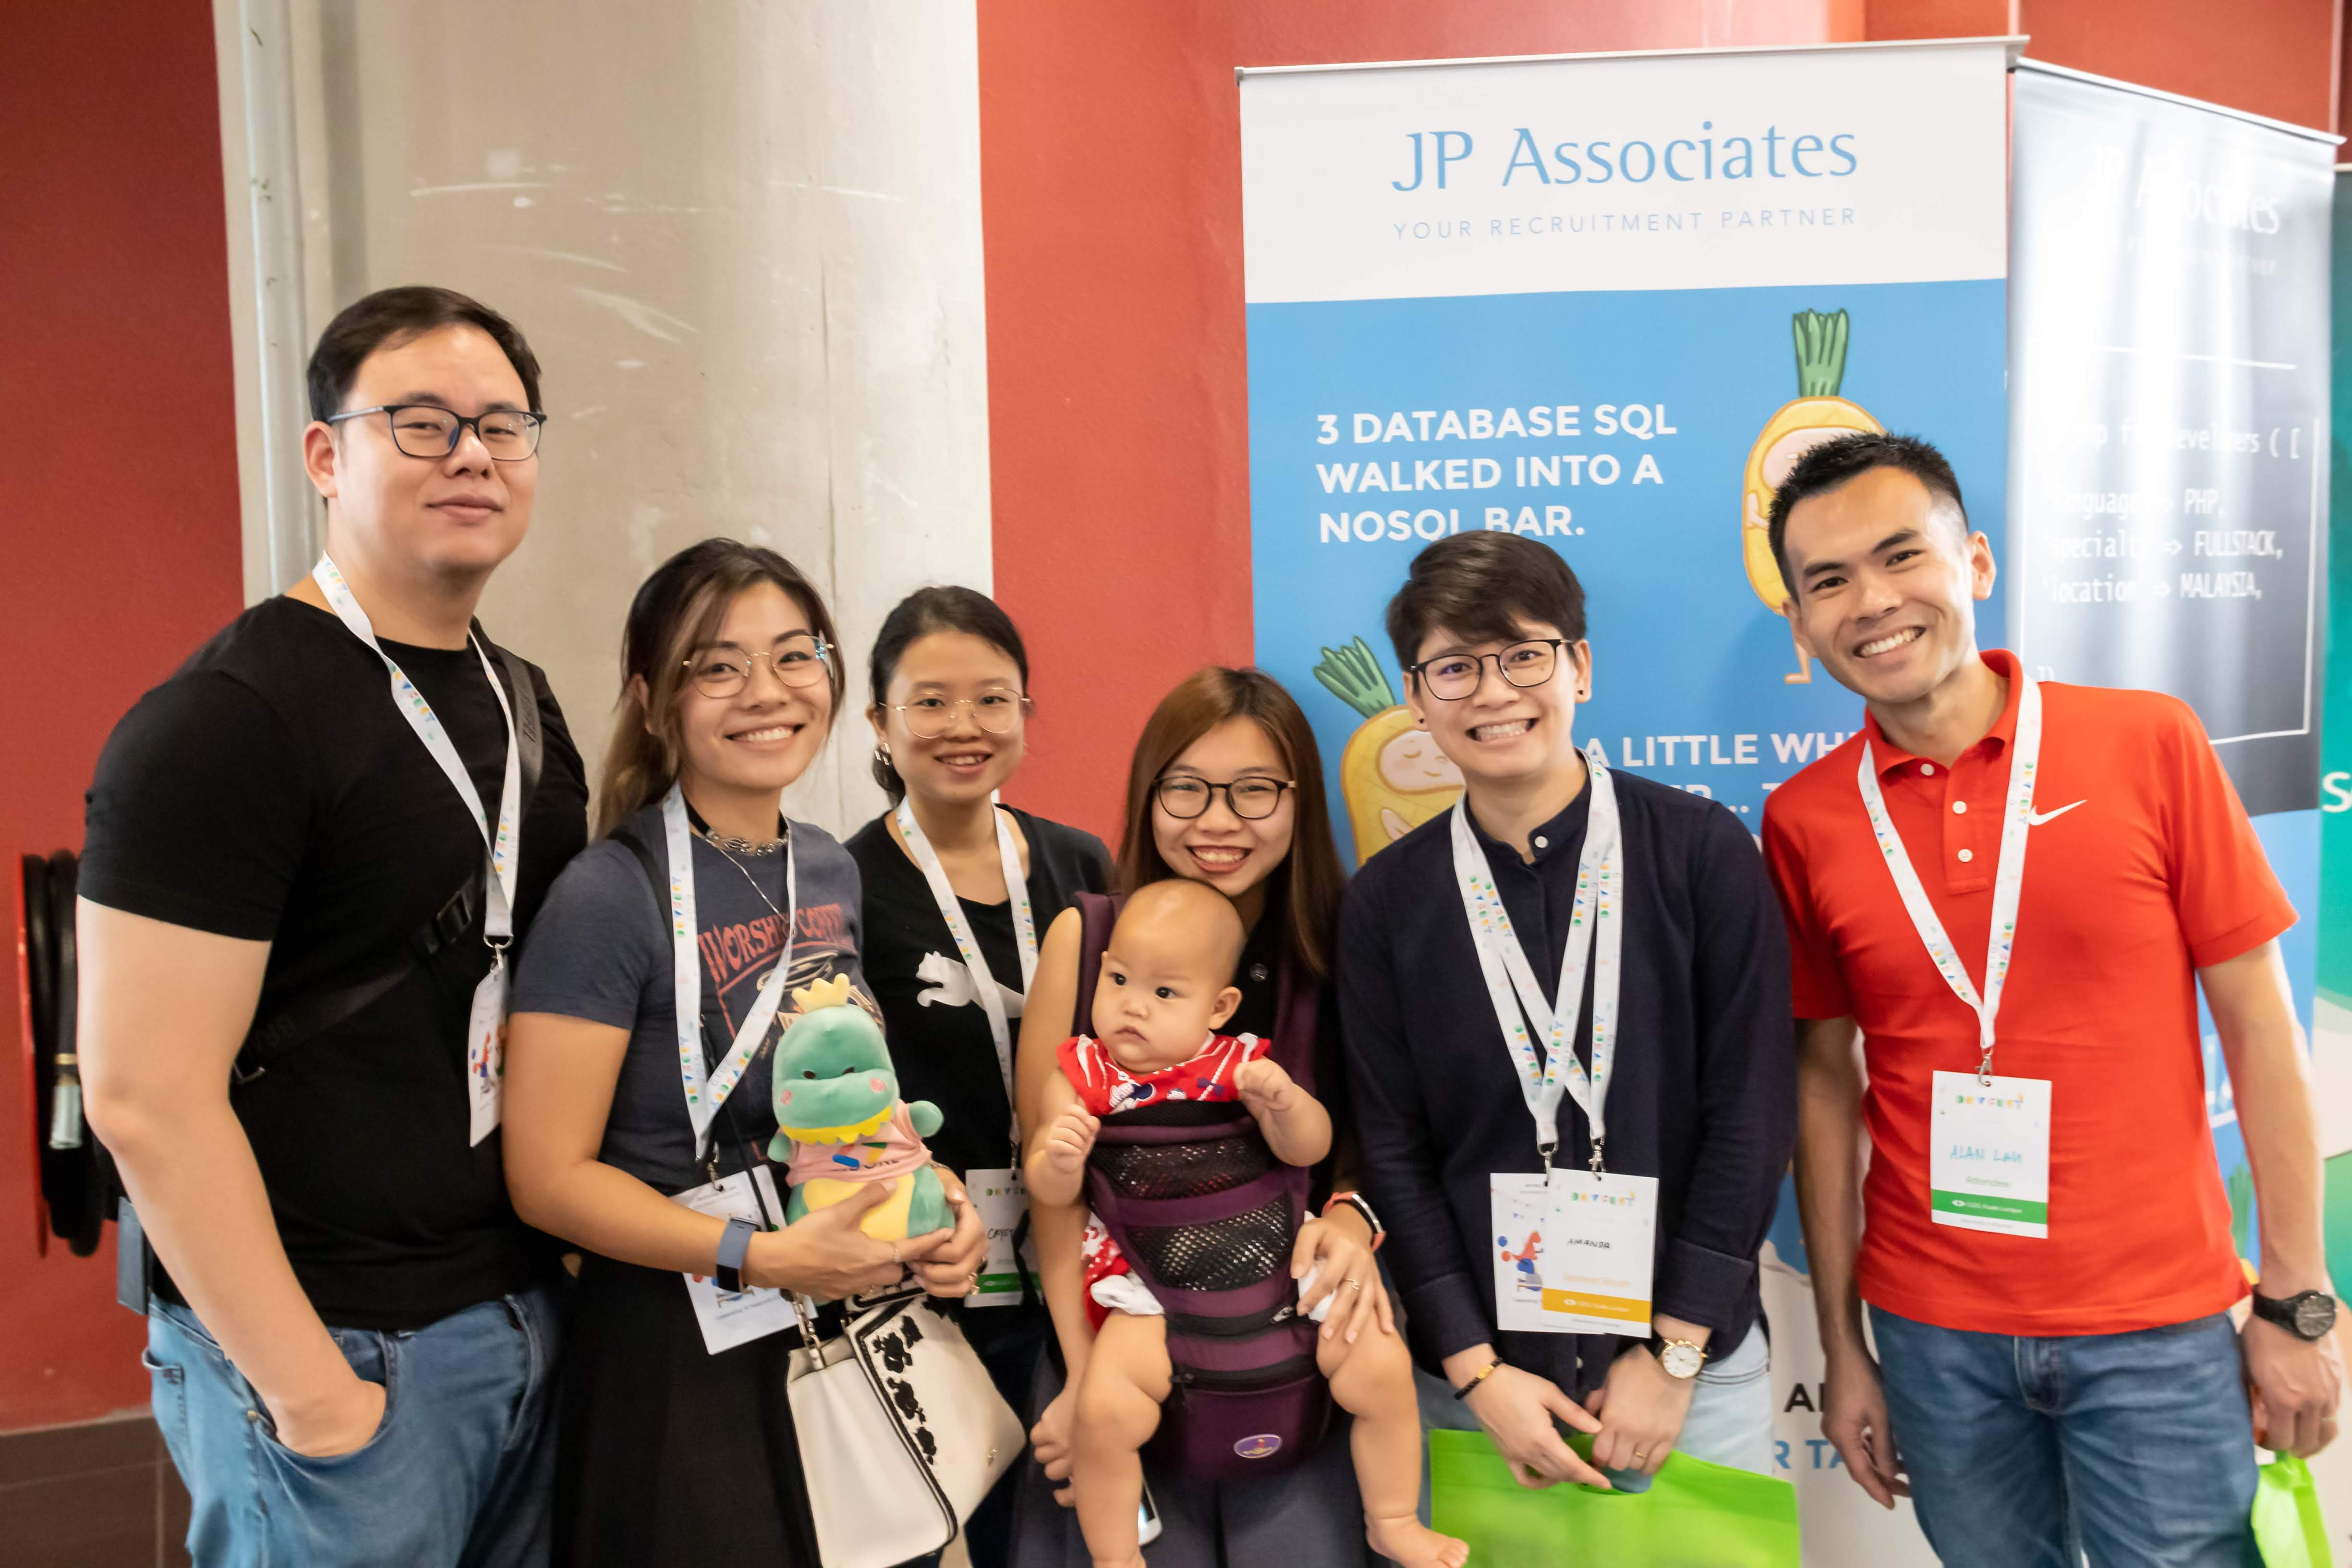 JP Associates IT Recruitment Firm Malaysia - team photo in Google Developer Group Kuala Lumpur 2019